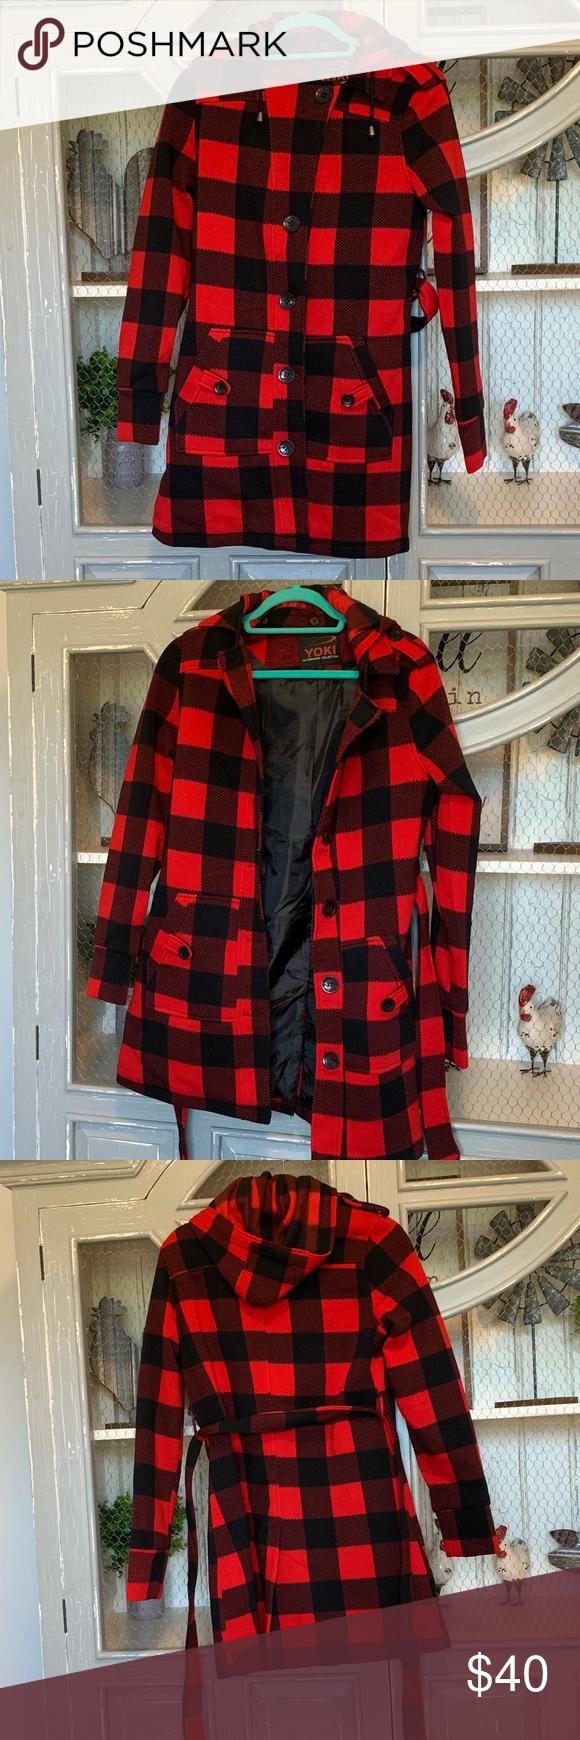 Hp Nwot Yoki Outerwear Coat Clothes Design Fashion Design Fashion [ 1740 x 580 Pixel ]